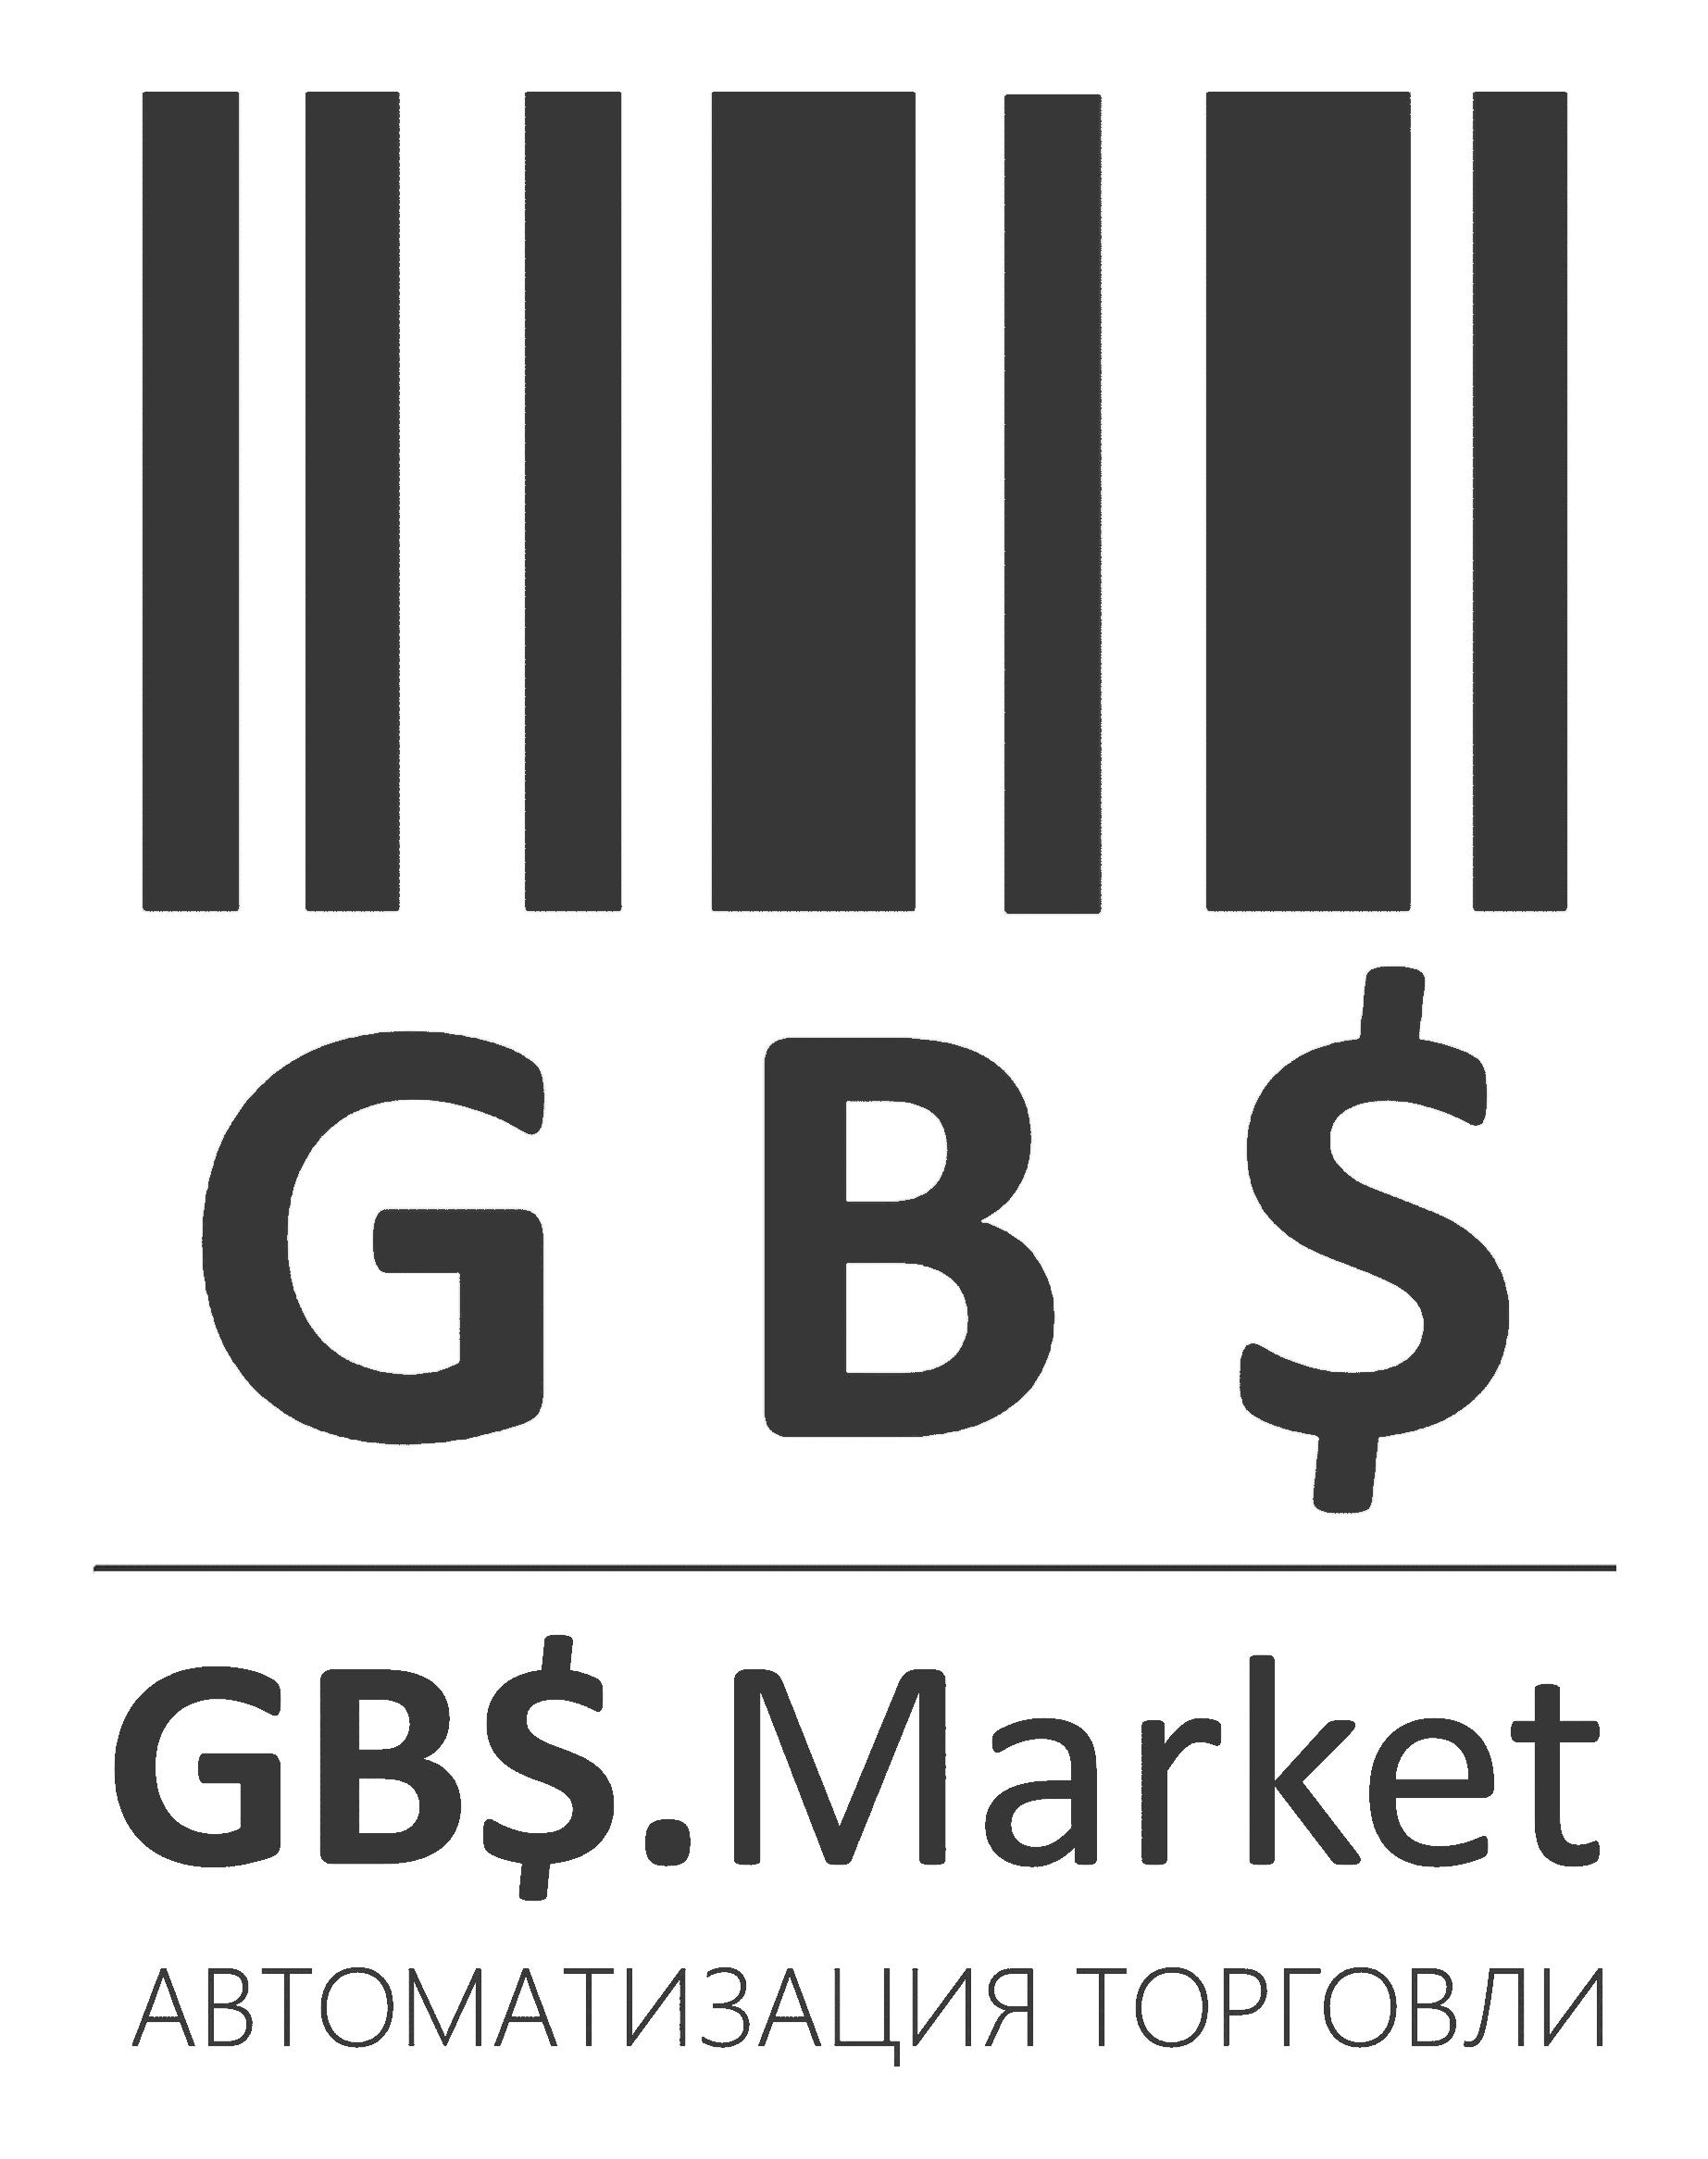 gbs.market, gbsmarket, автоматизация, торговля, логотип